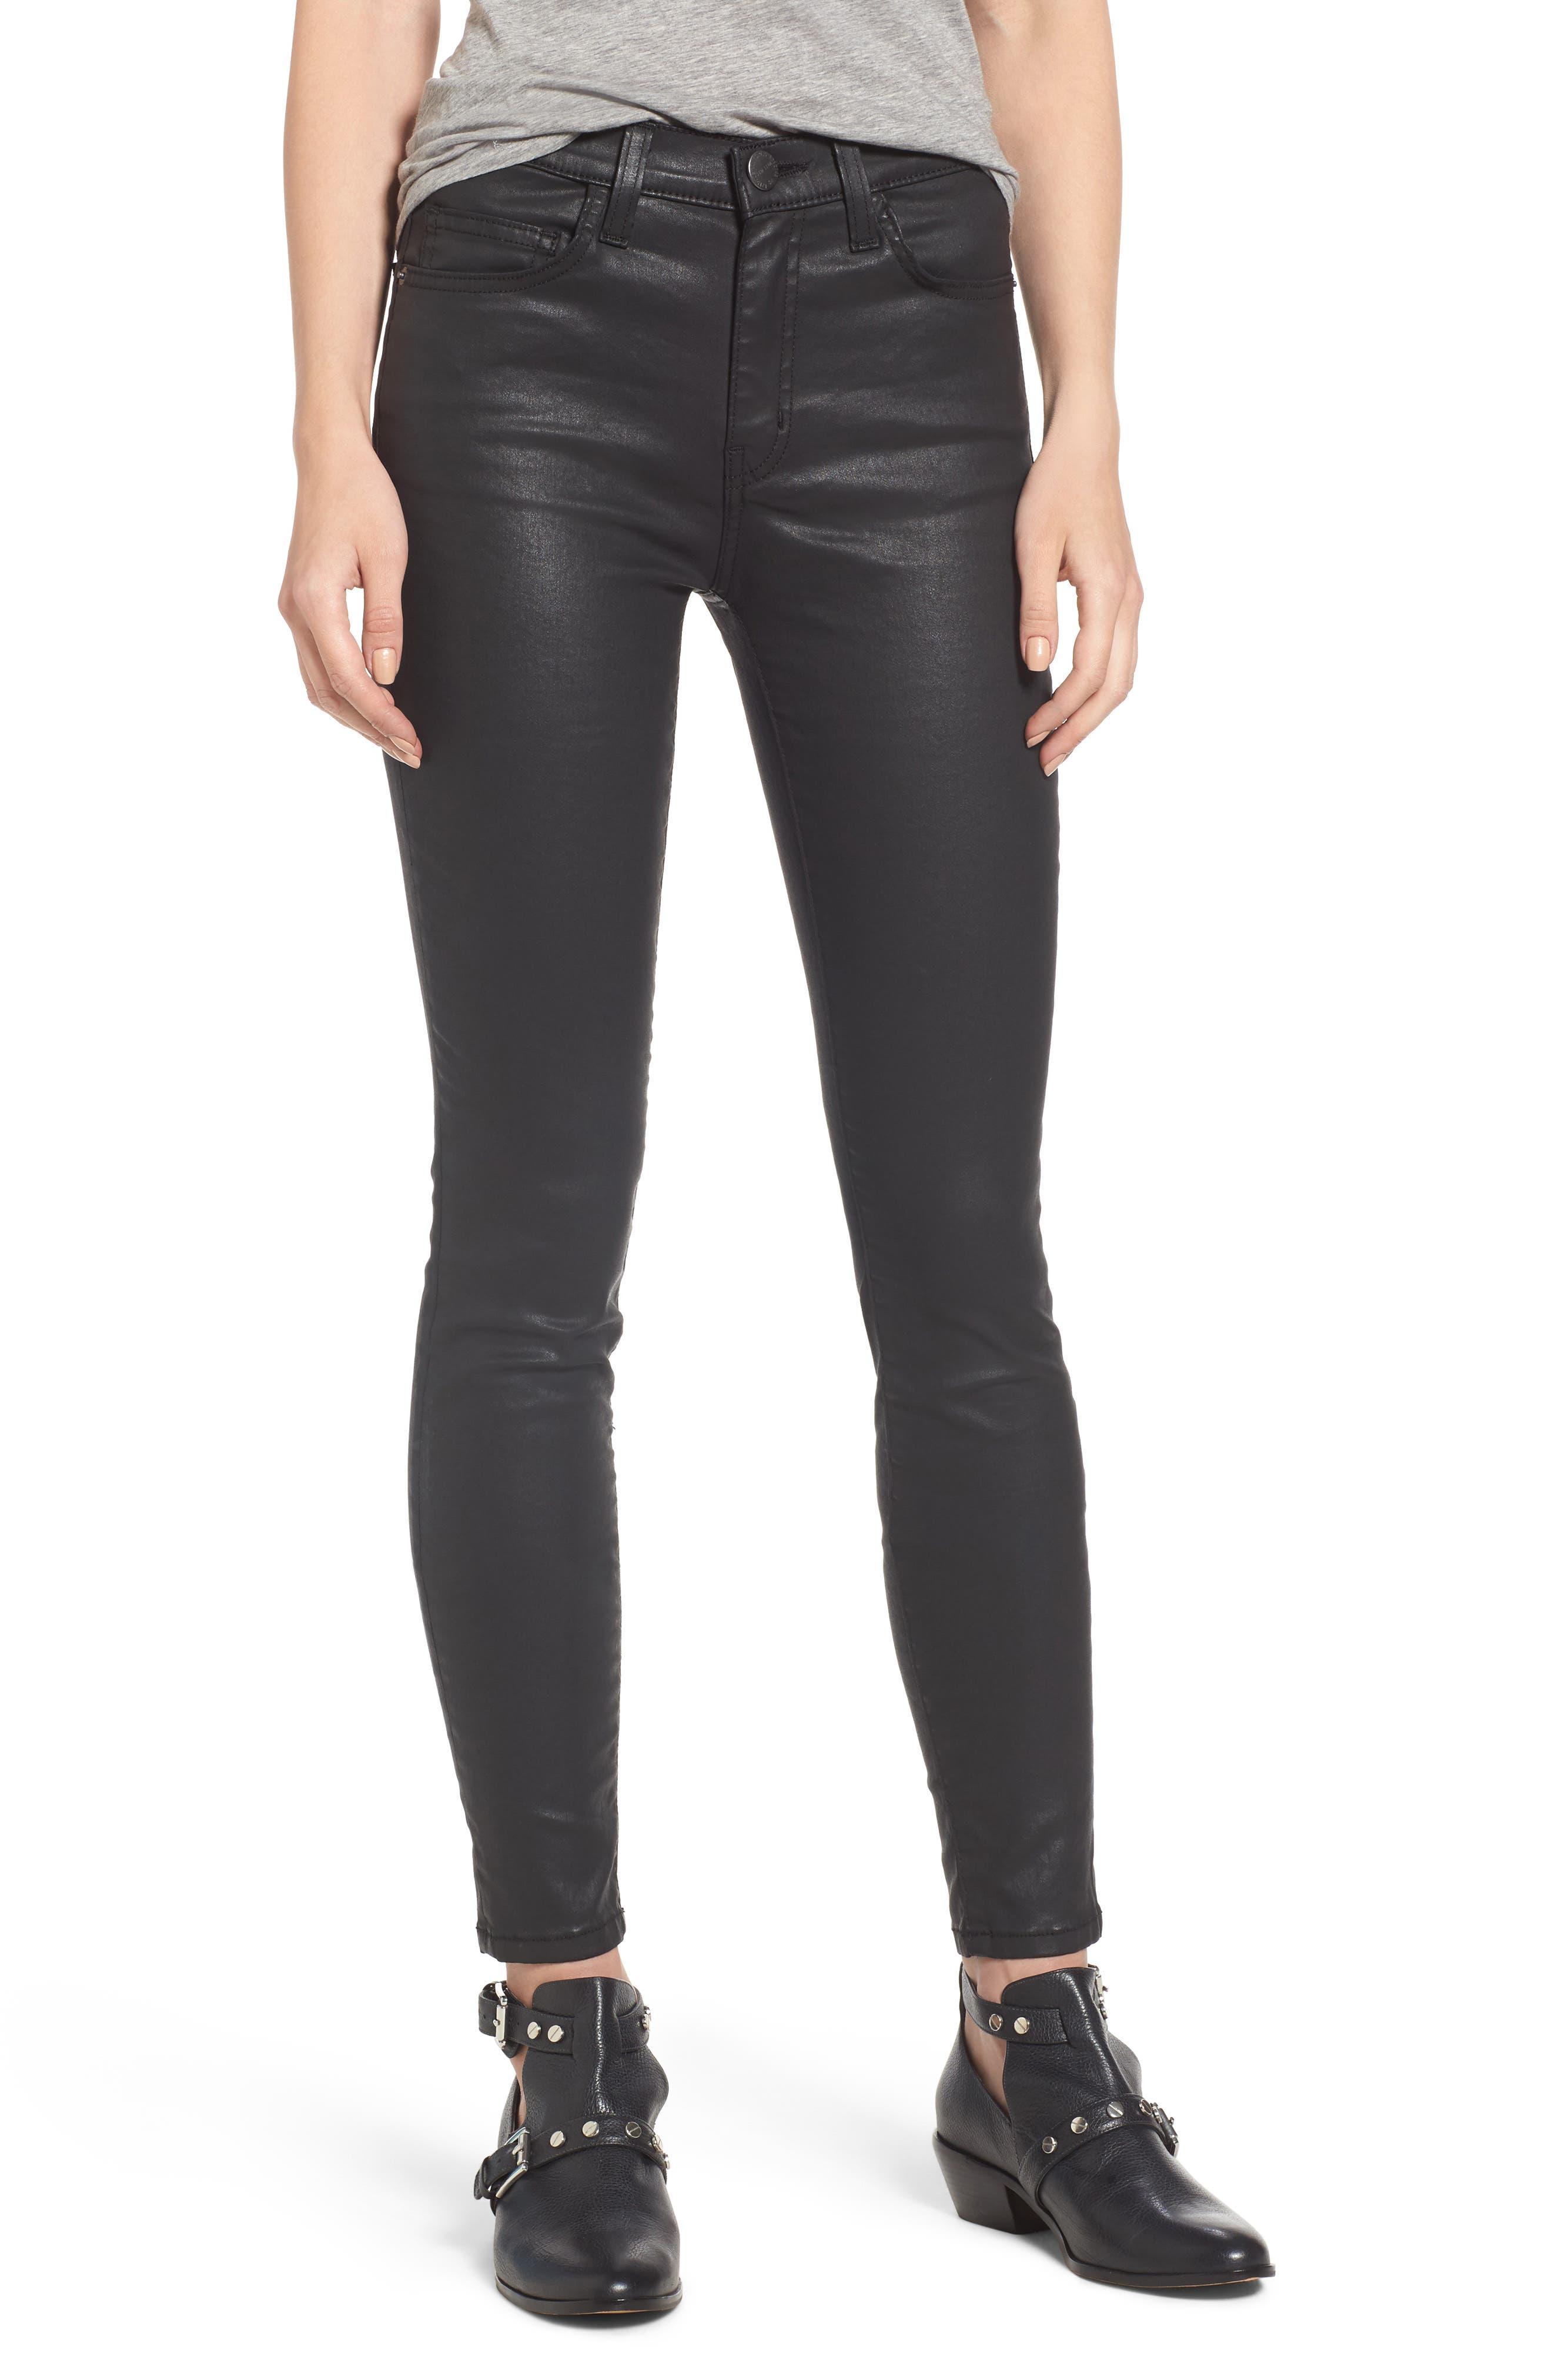 Main Image - Current/Elliott The High Waist Ankle Skinny Jeans (Black Coated)